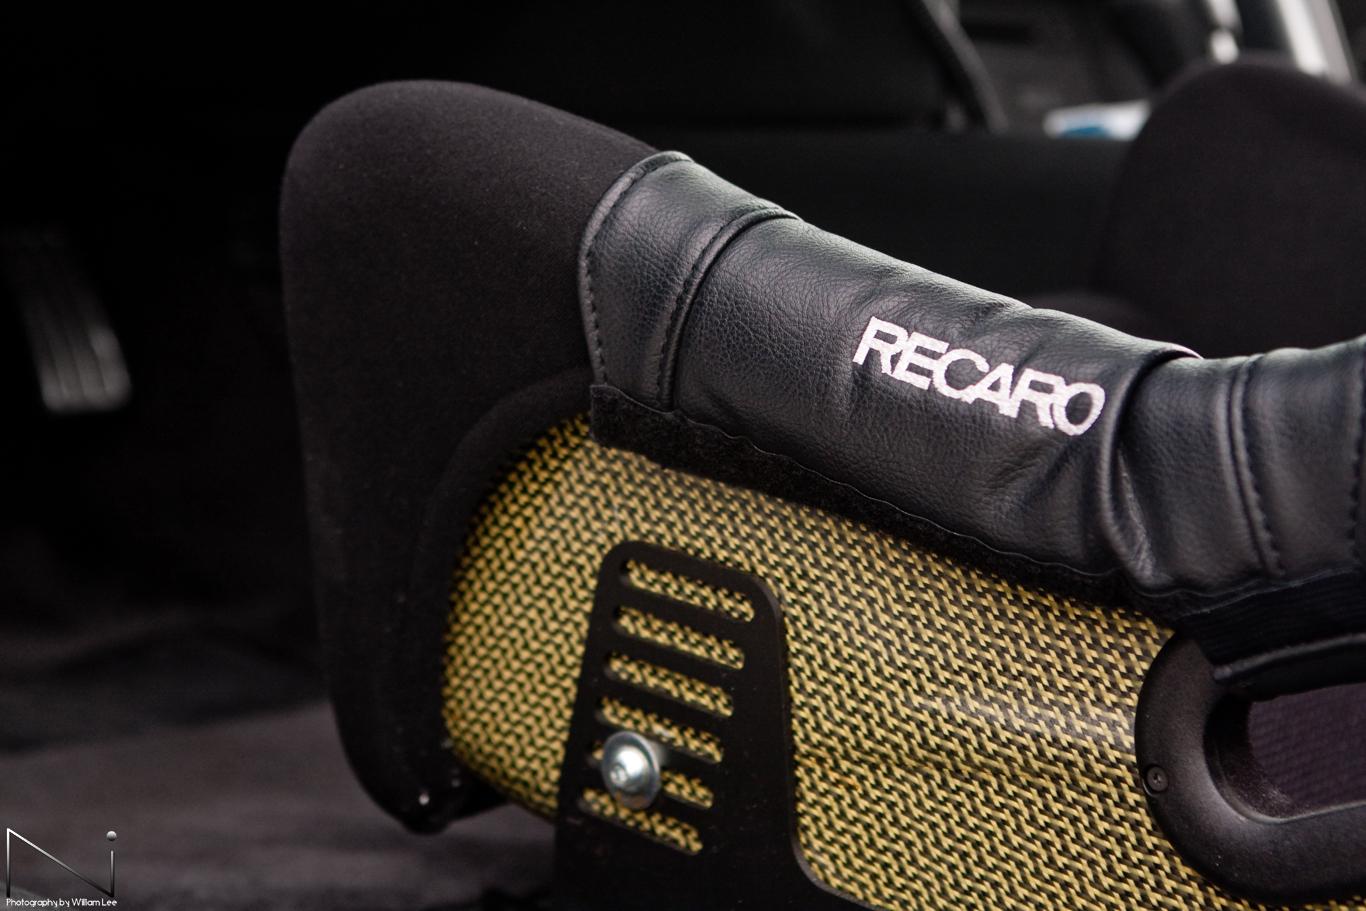 Recaro Profi Carbon-Kevlar SPA seats pad